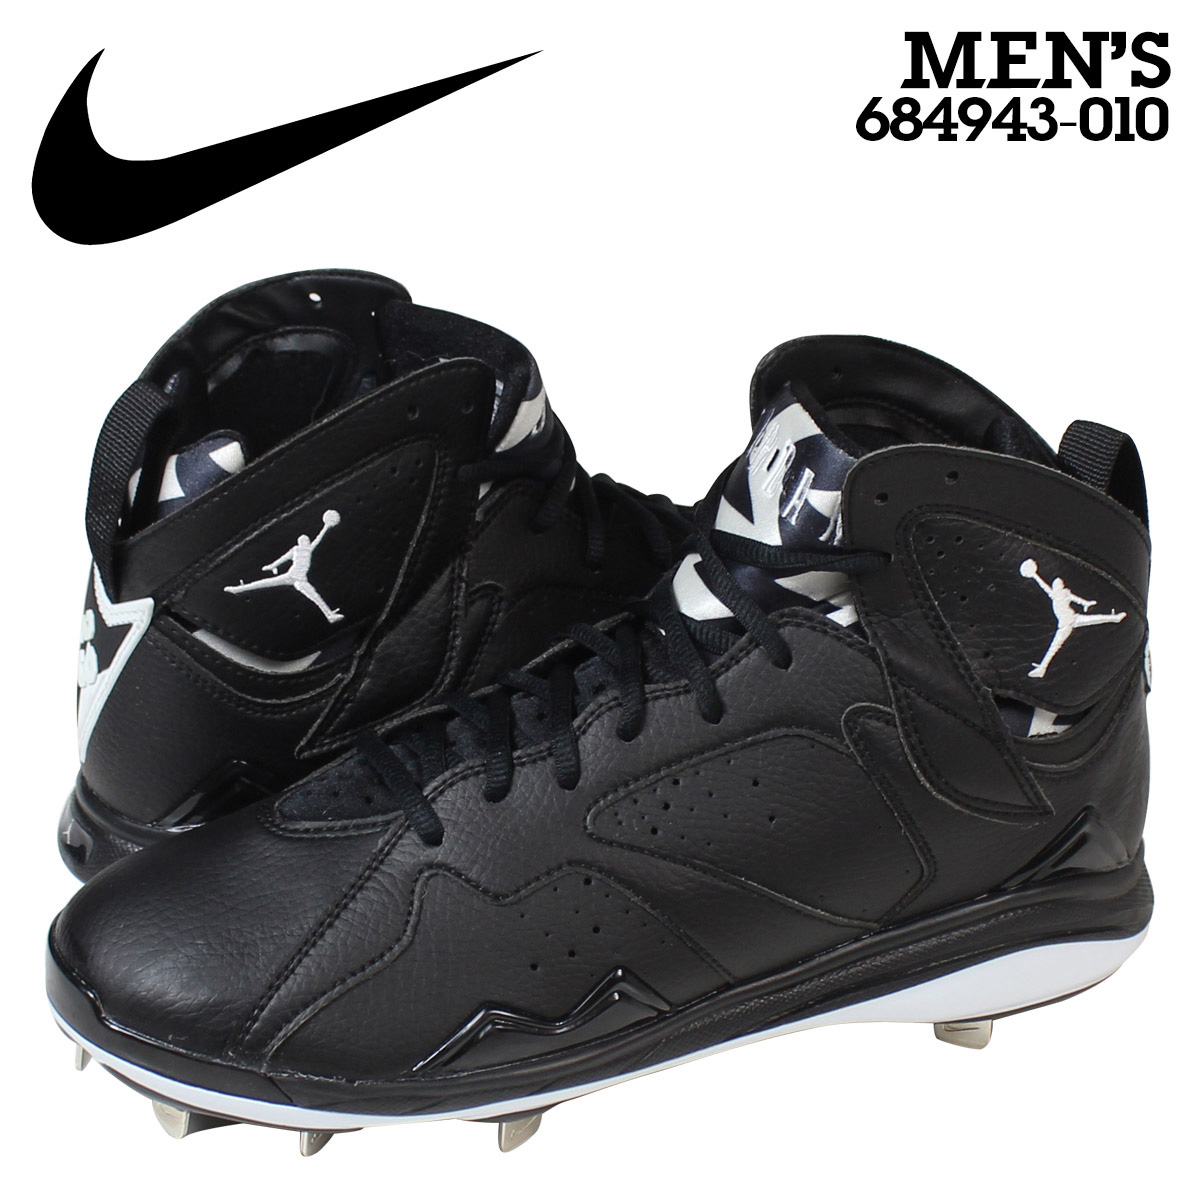 outlet store b4745 de16f NIKE Nike Air Jordan 7 nostalgic spikes men AIR JORDAN 7 RETRO METAL  684,943-010 black black